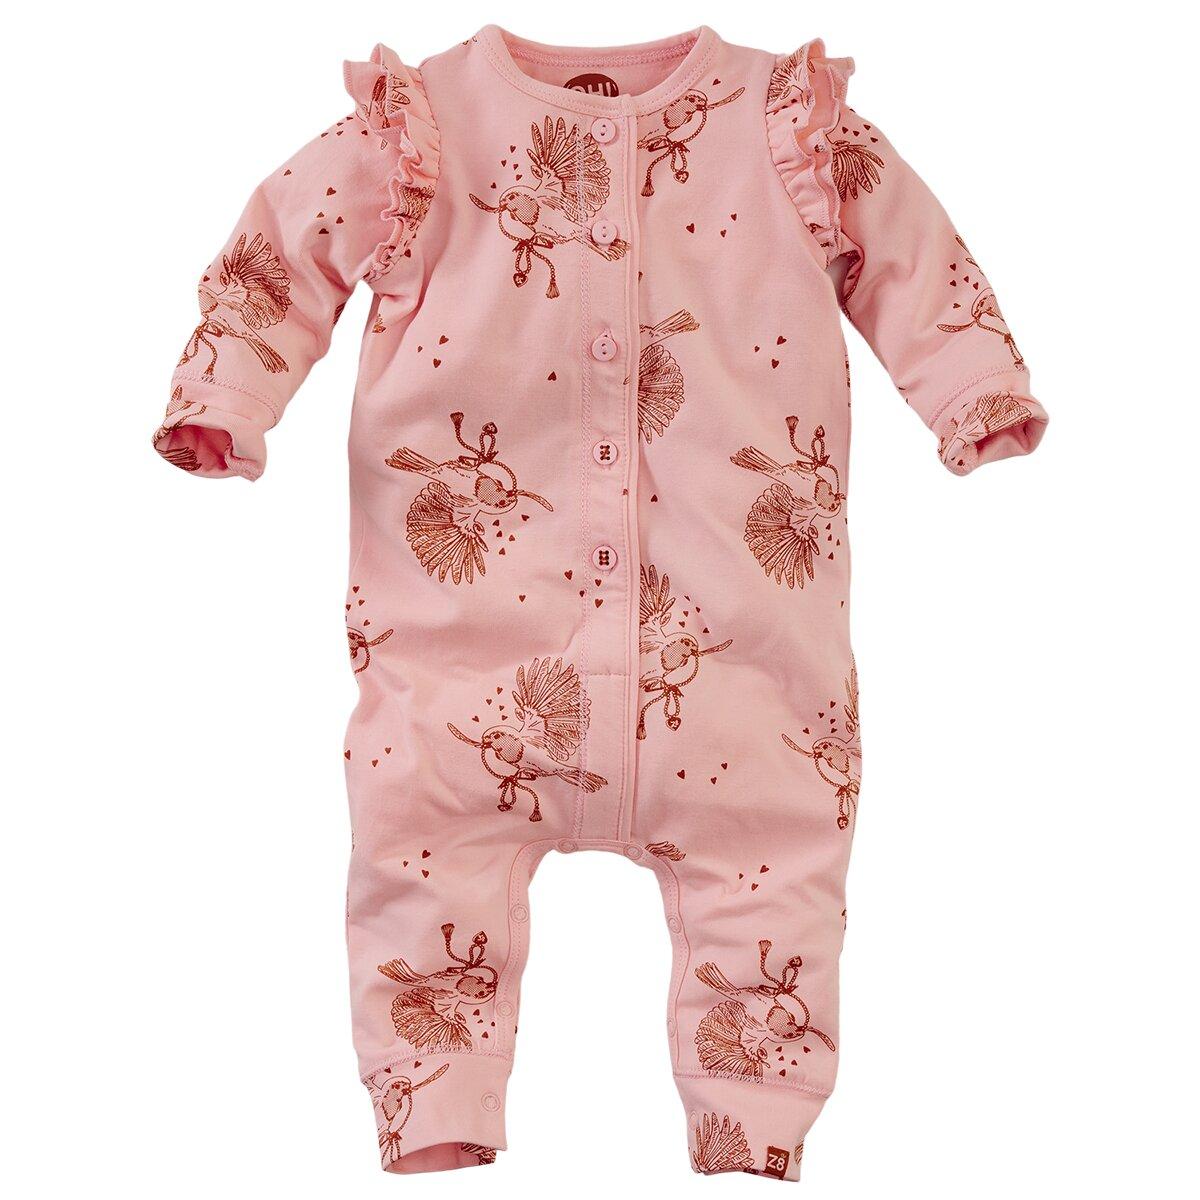 z8-newbornw20210028santa-anna